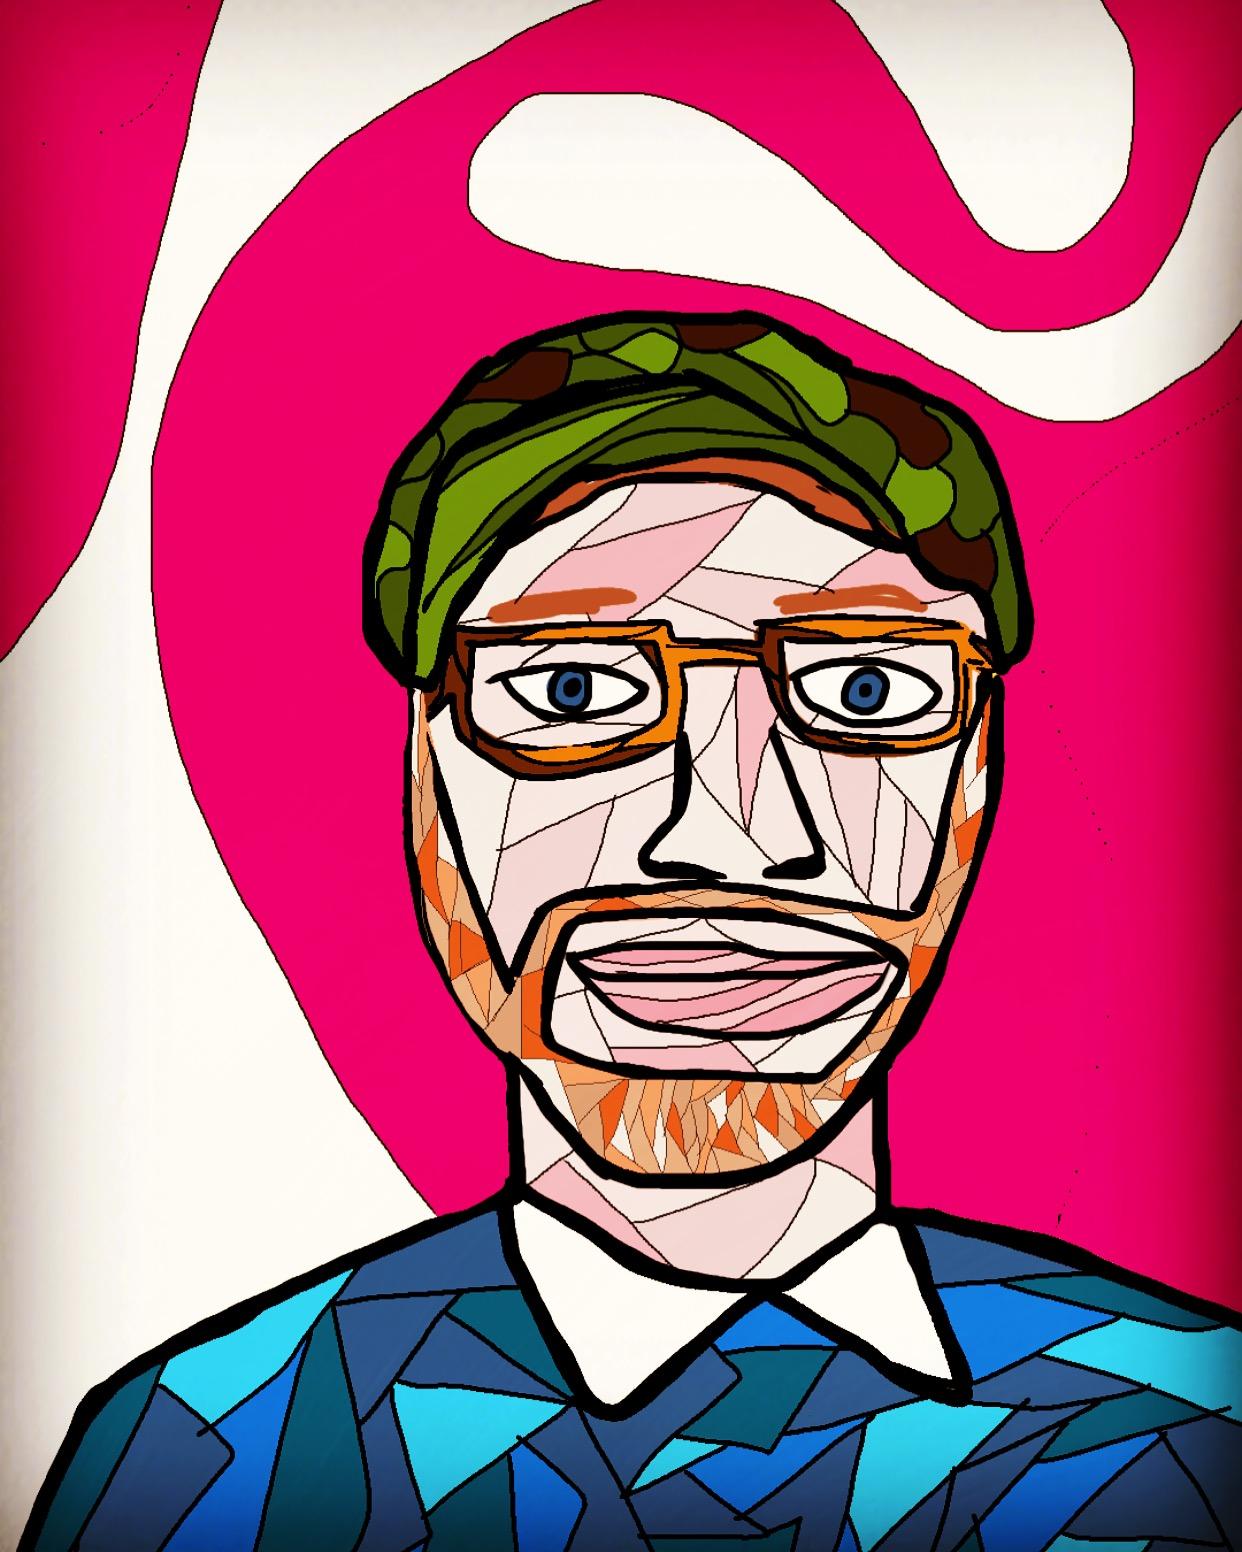 Dwight Easter - Artist, family man, bread merchant.